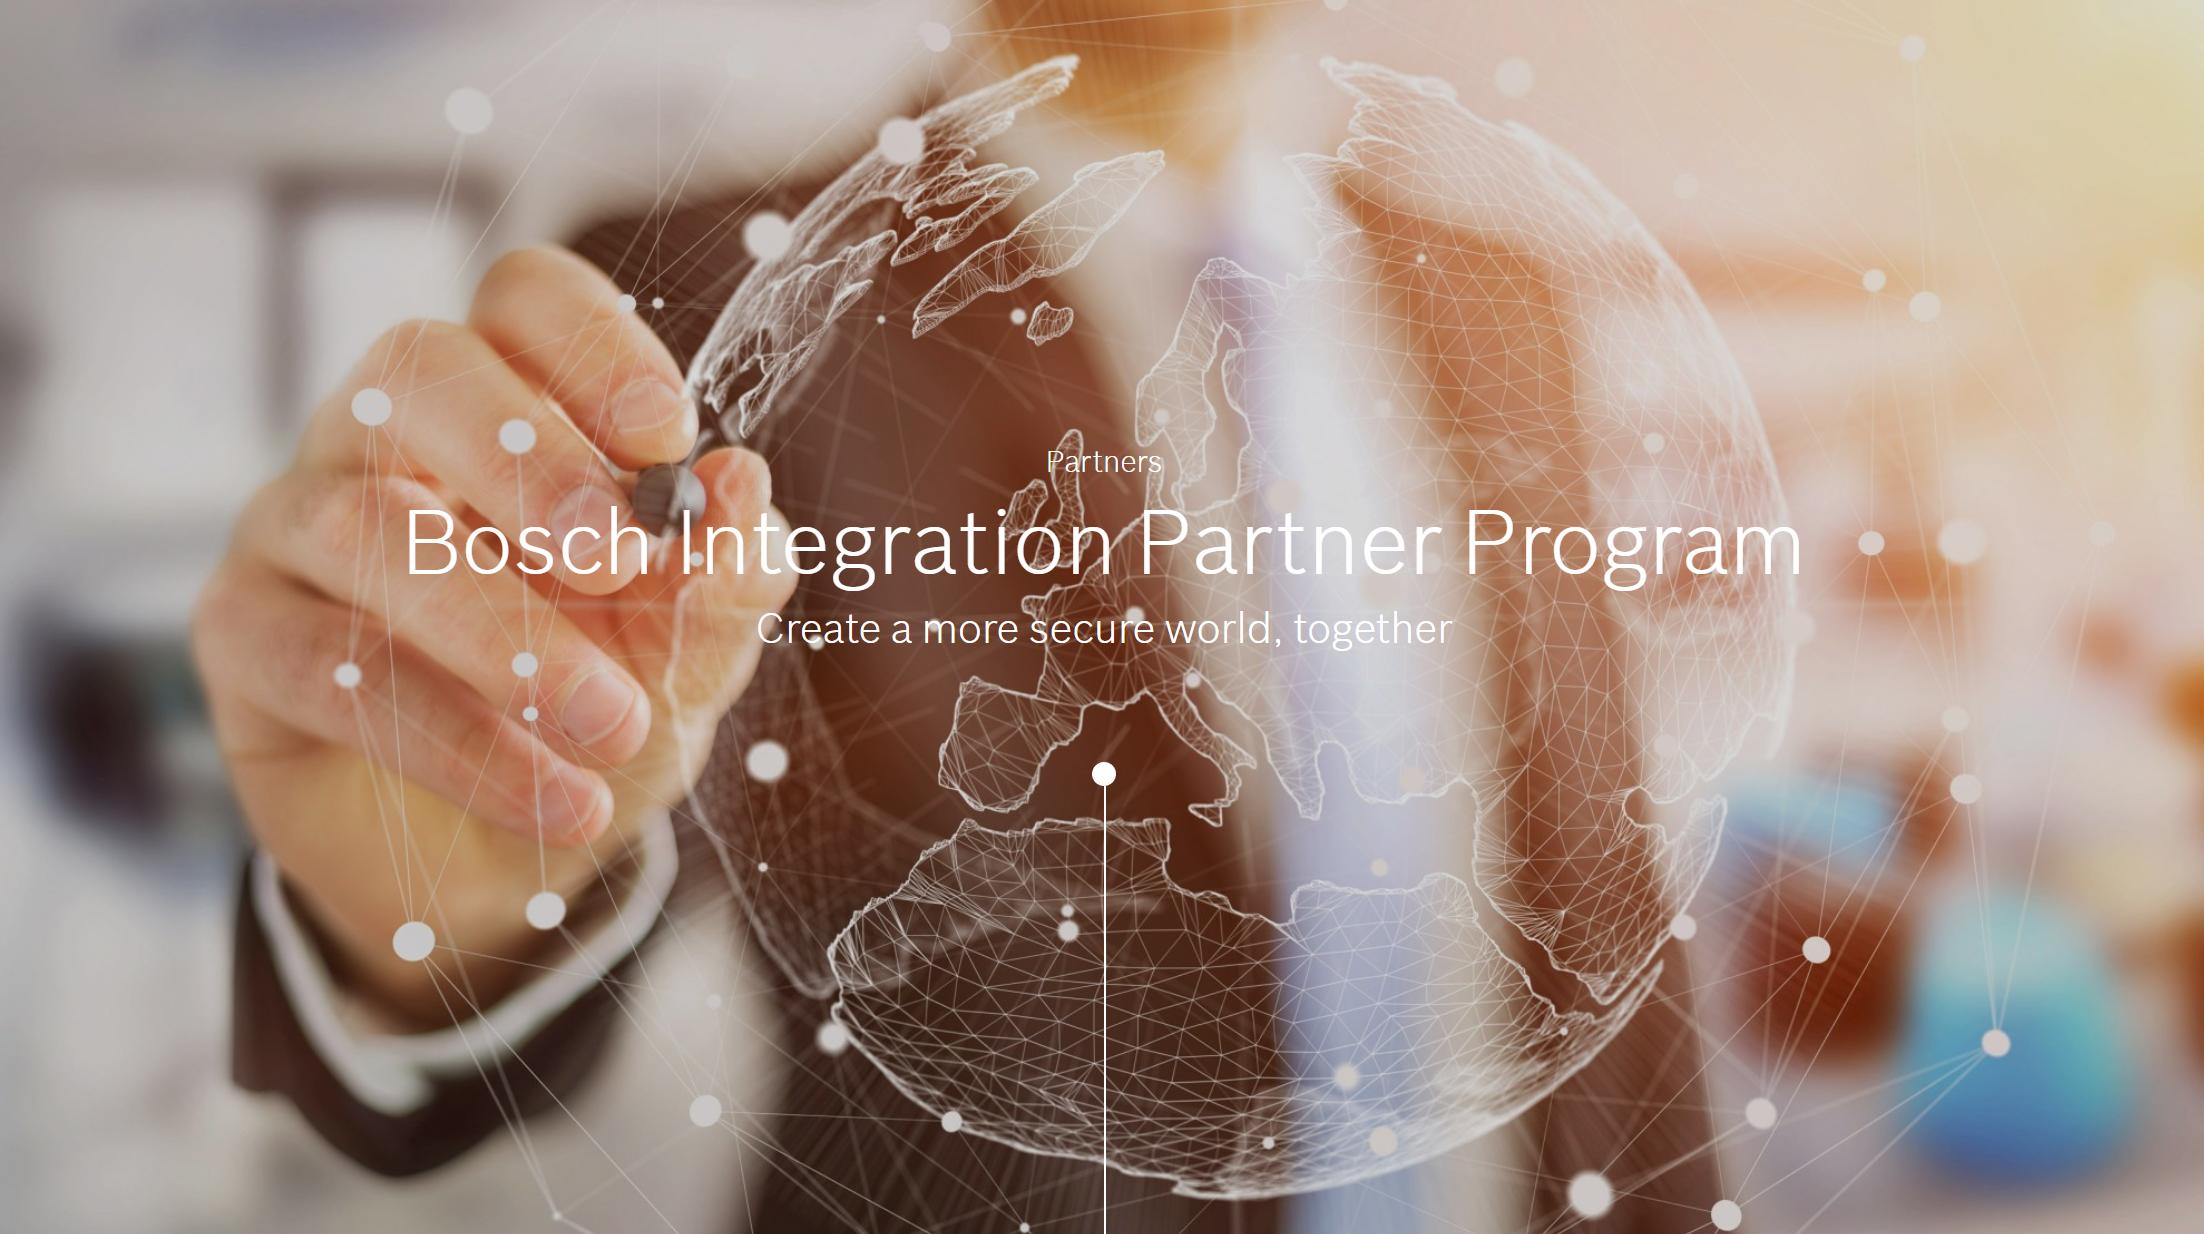 Bosch IPP portal image